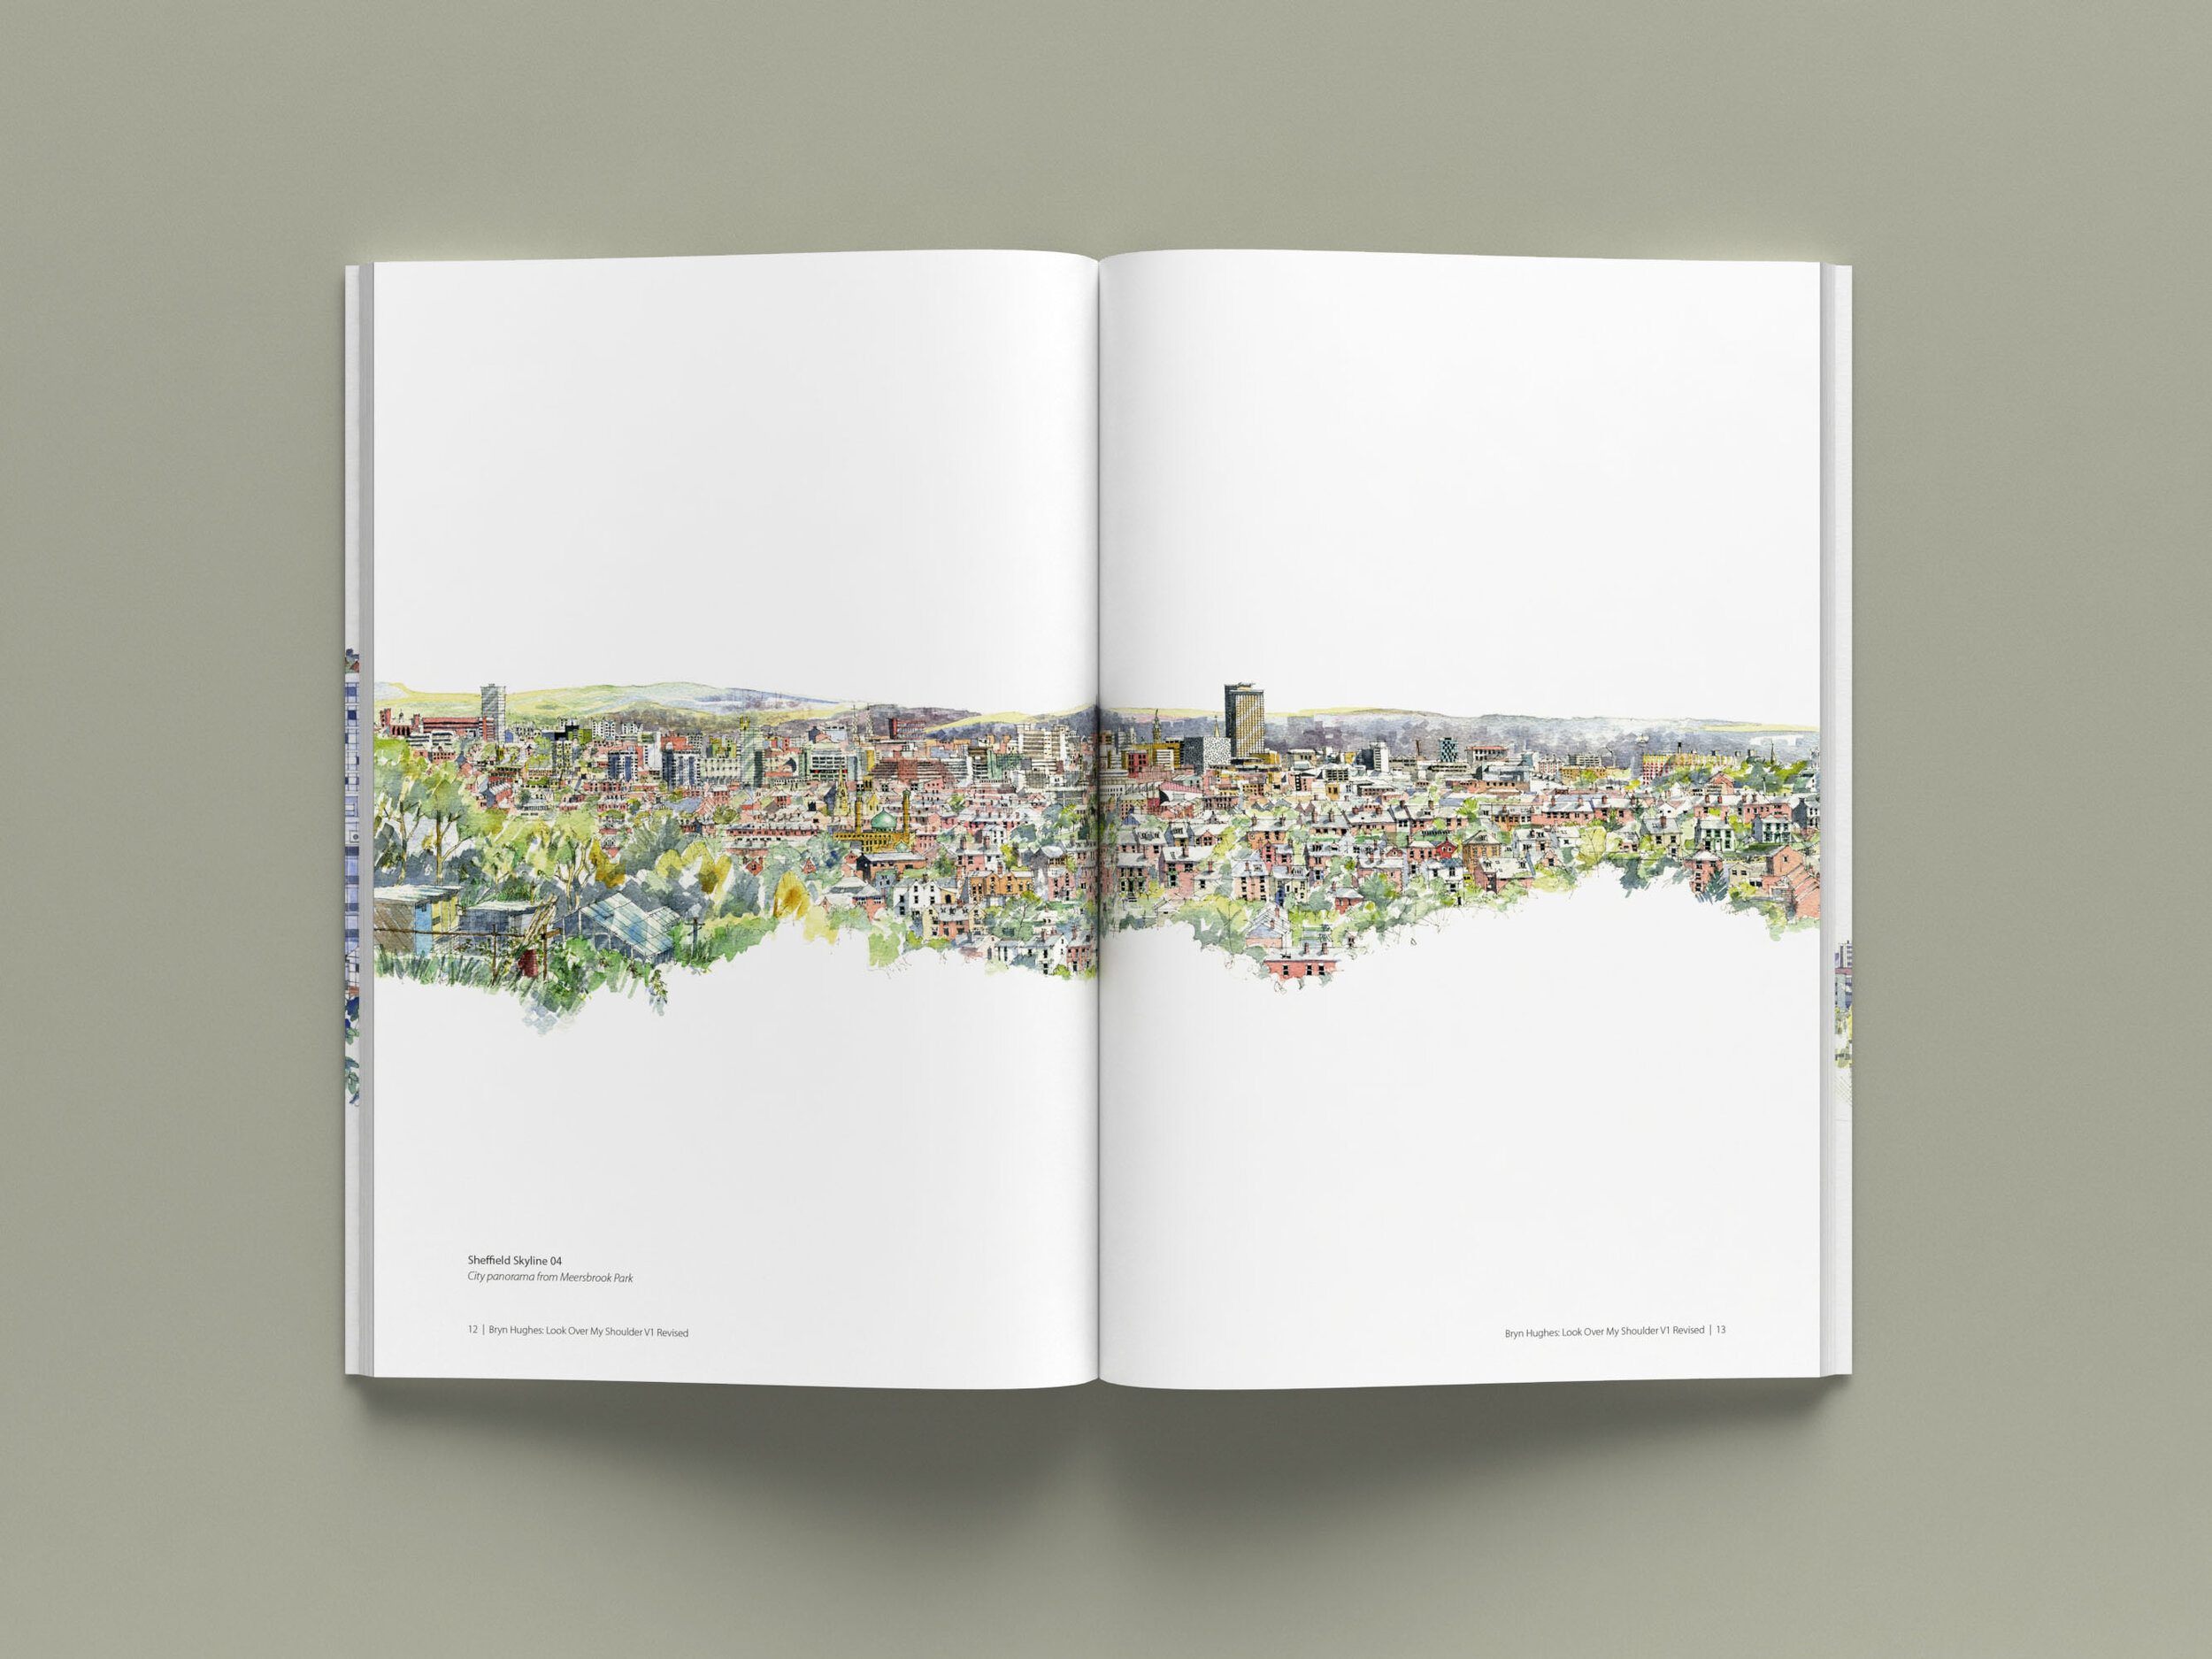 BRYN-HUGHES-ARTIST-SOFTBACK-BOOK02-B-_0035_Group 7.jpg